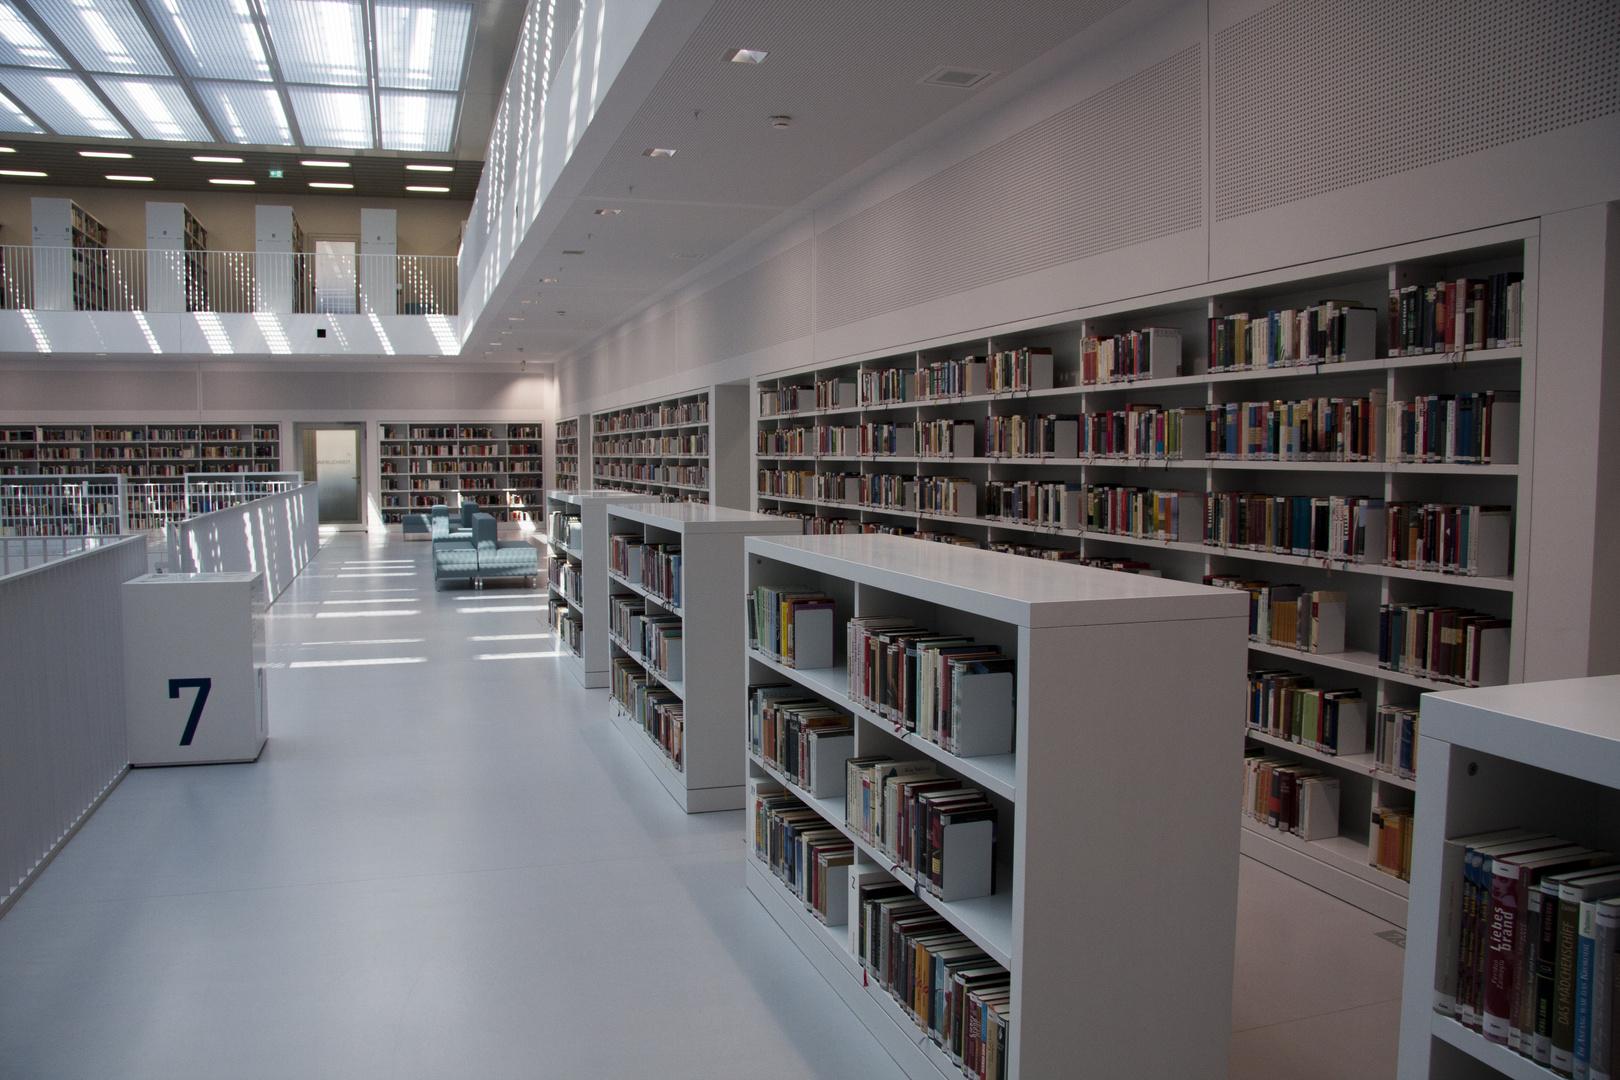 Stuttgart neue bibliothek 3 foto bild architektur for Neue architektur stuttgart